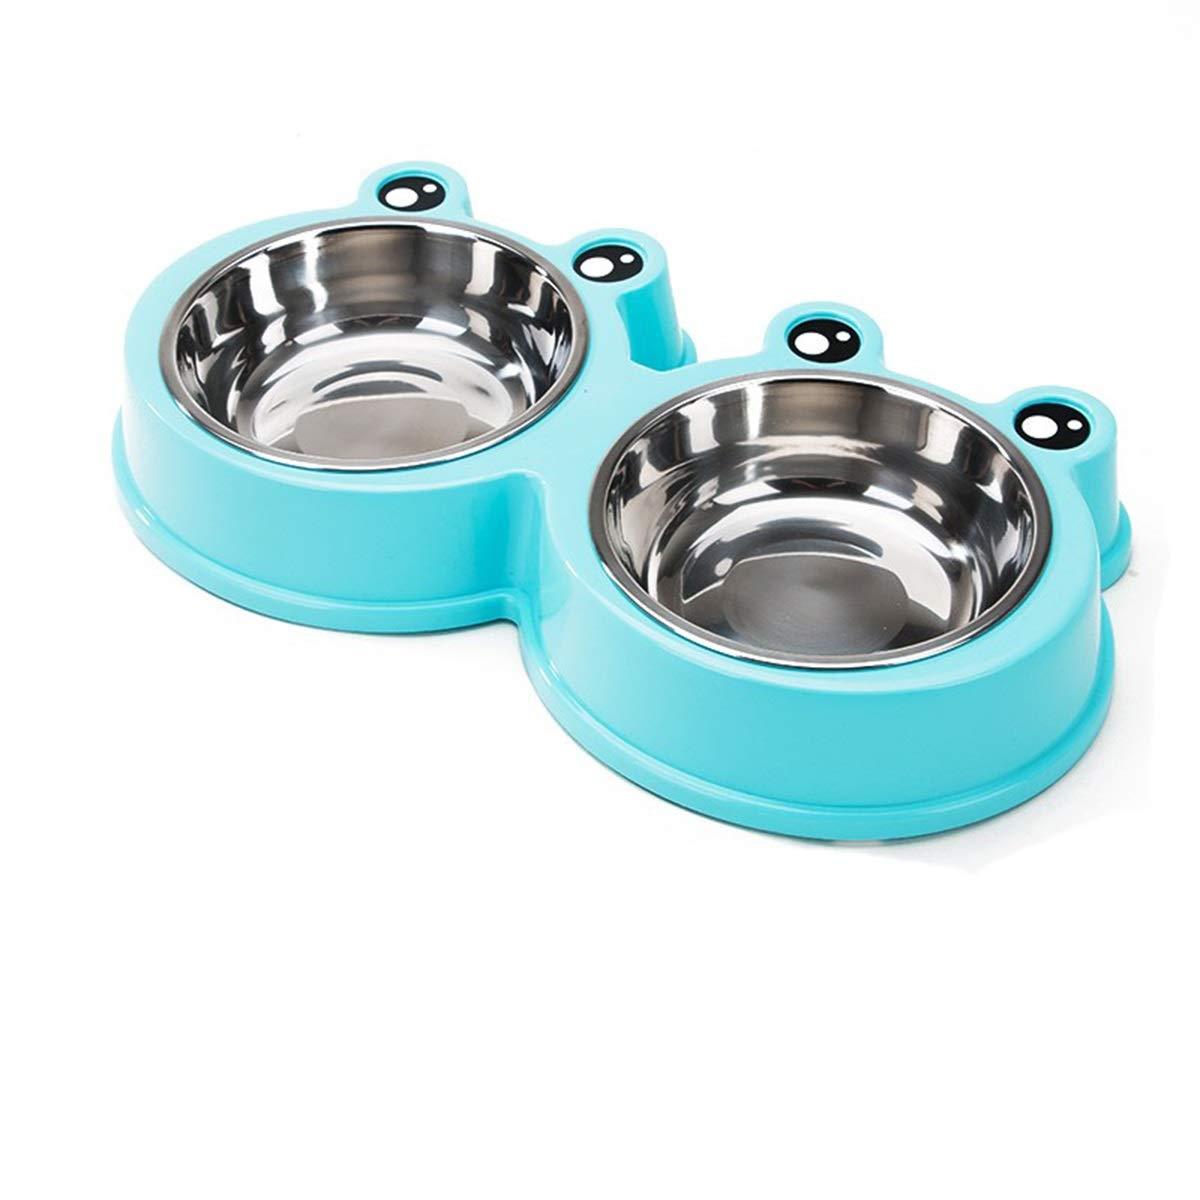 bluee S bluee S Dog Bowl, Dog Bowl, Cat Bowl, Cat Food Bowl, Dog Double Bowl, Cute Print Pet Supplies, Pet Bowl, Frog Shape, bluee, Yellow, Pink (color   bluee, Size   S)